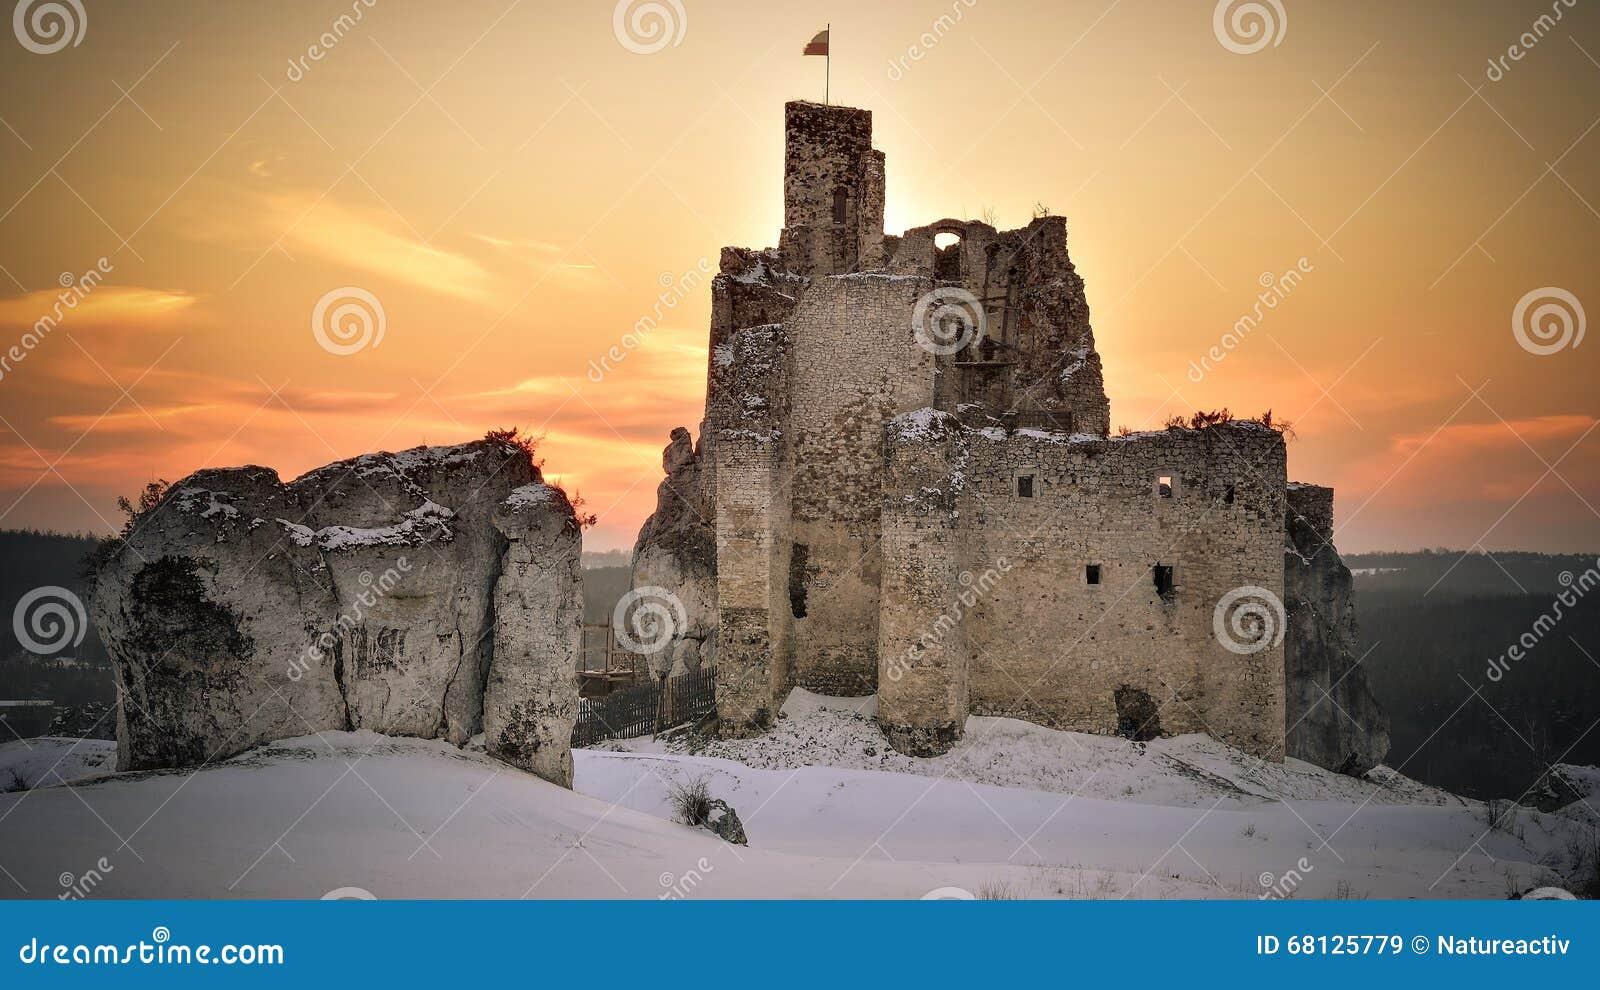 Mirow castle in Poland.